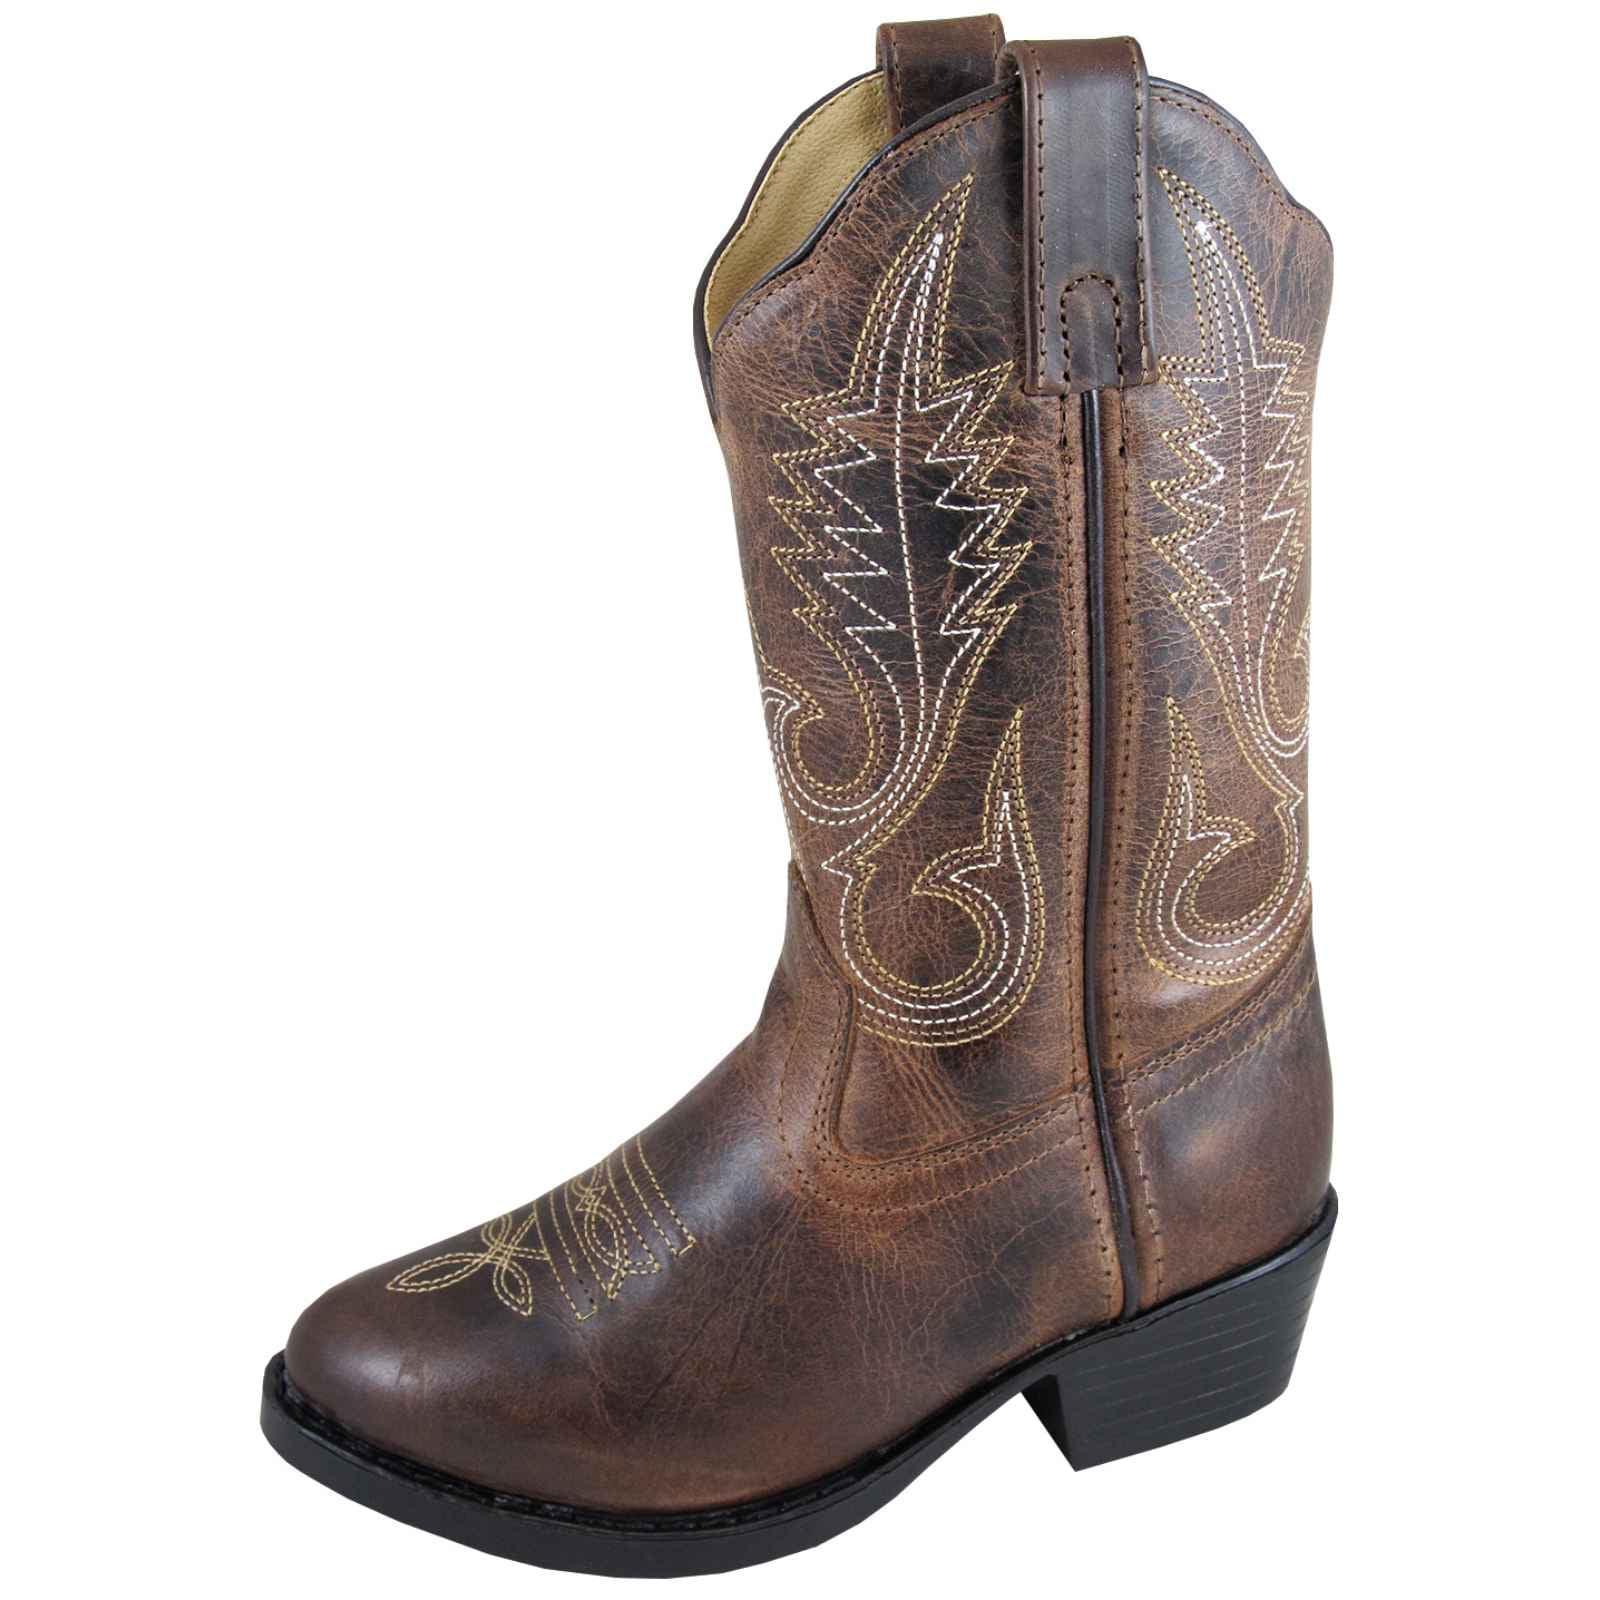 Smoky Mountain Girls' Annie Western Boot Round Toe - 3435C